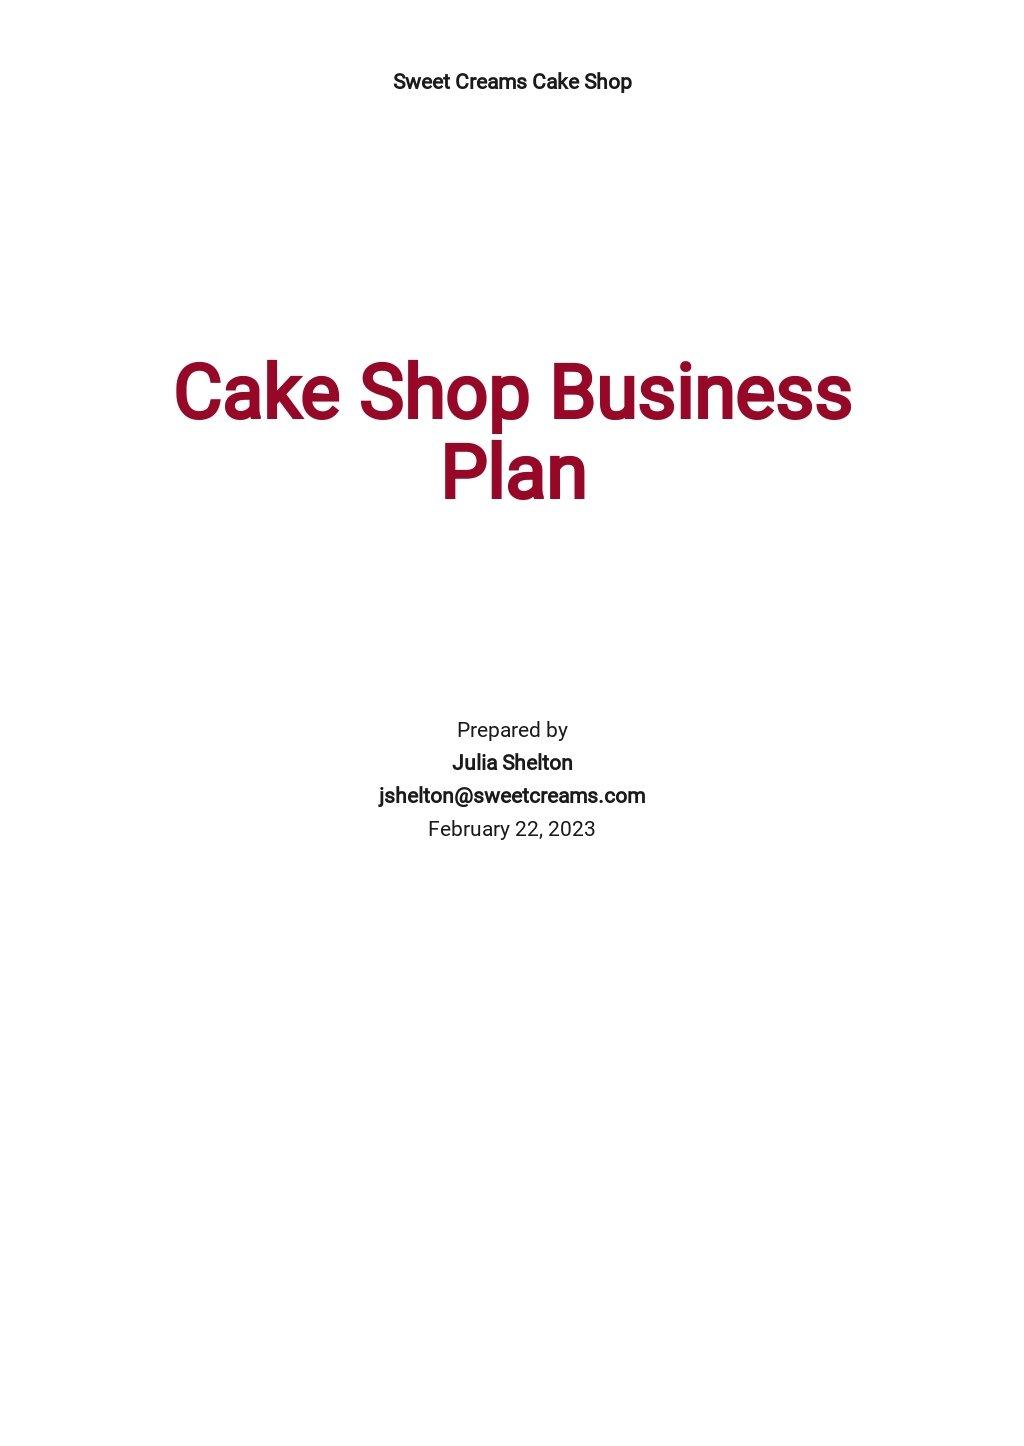 Cake Shop Business Plan Template.jpe